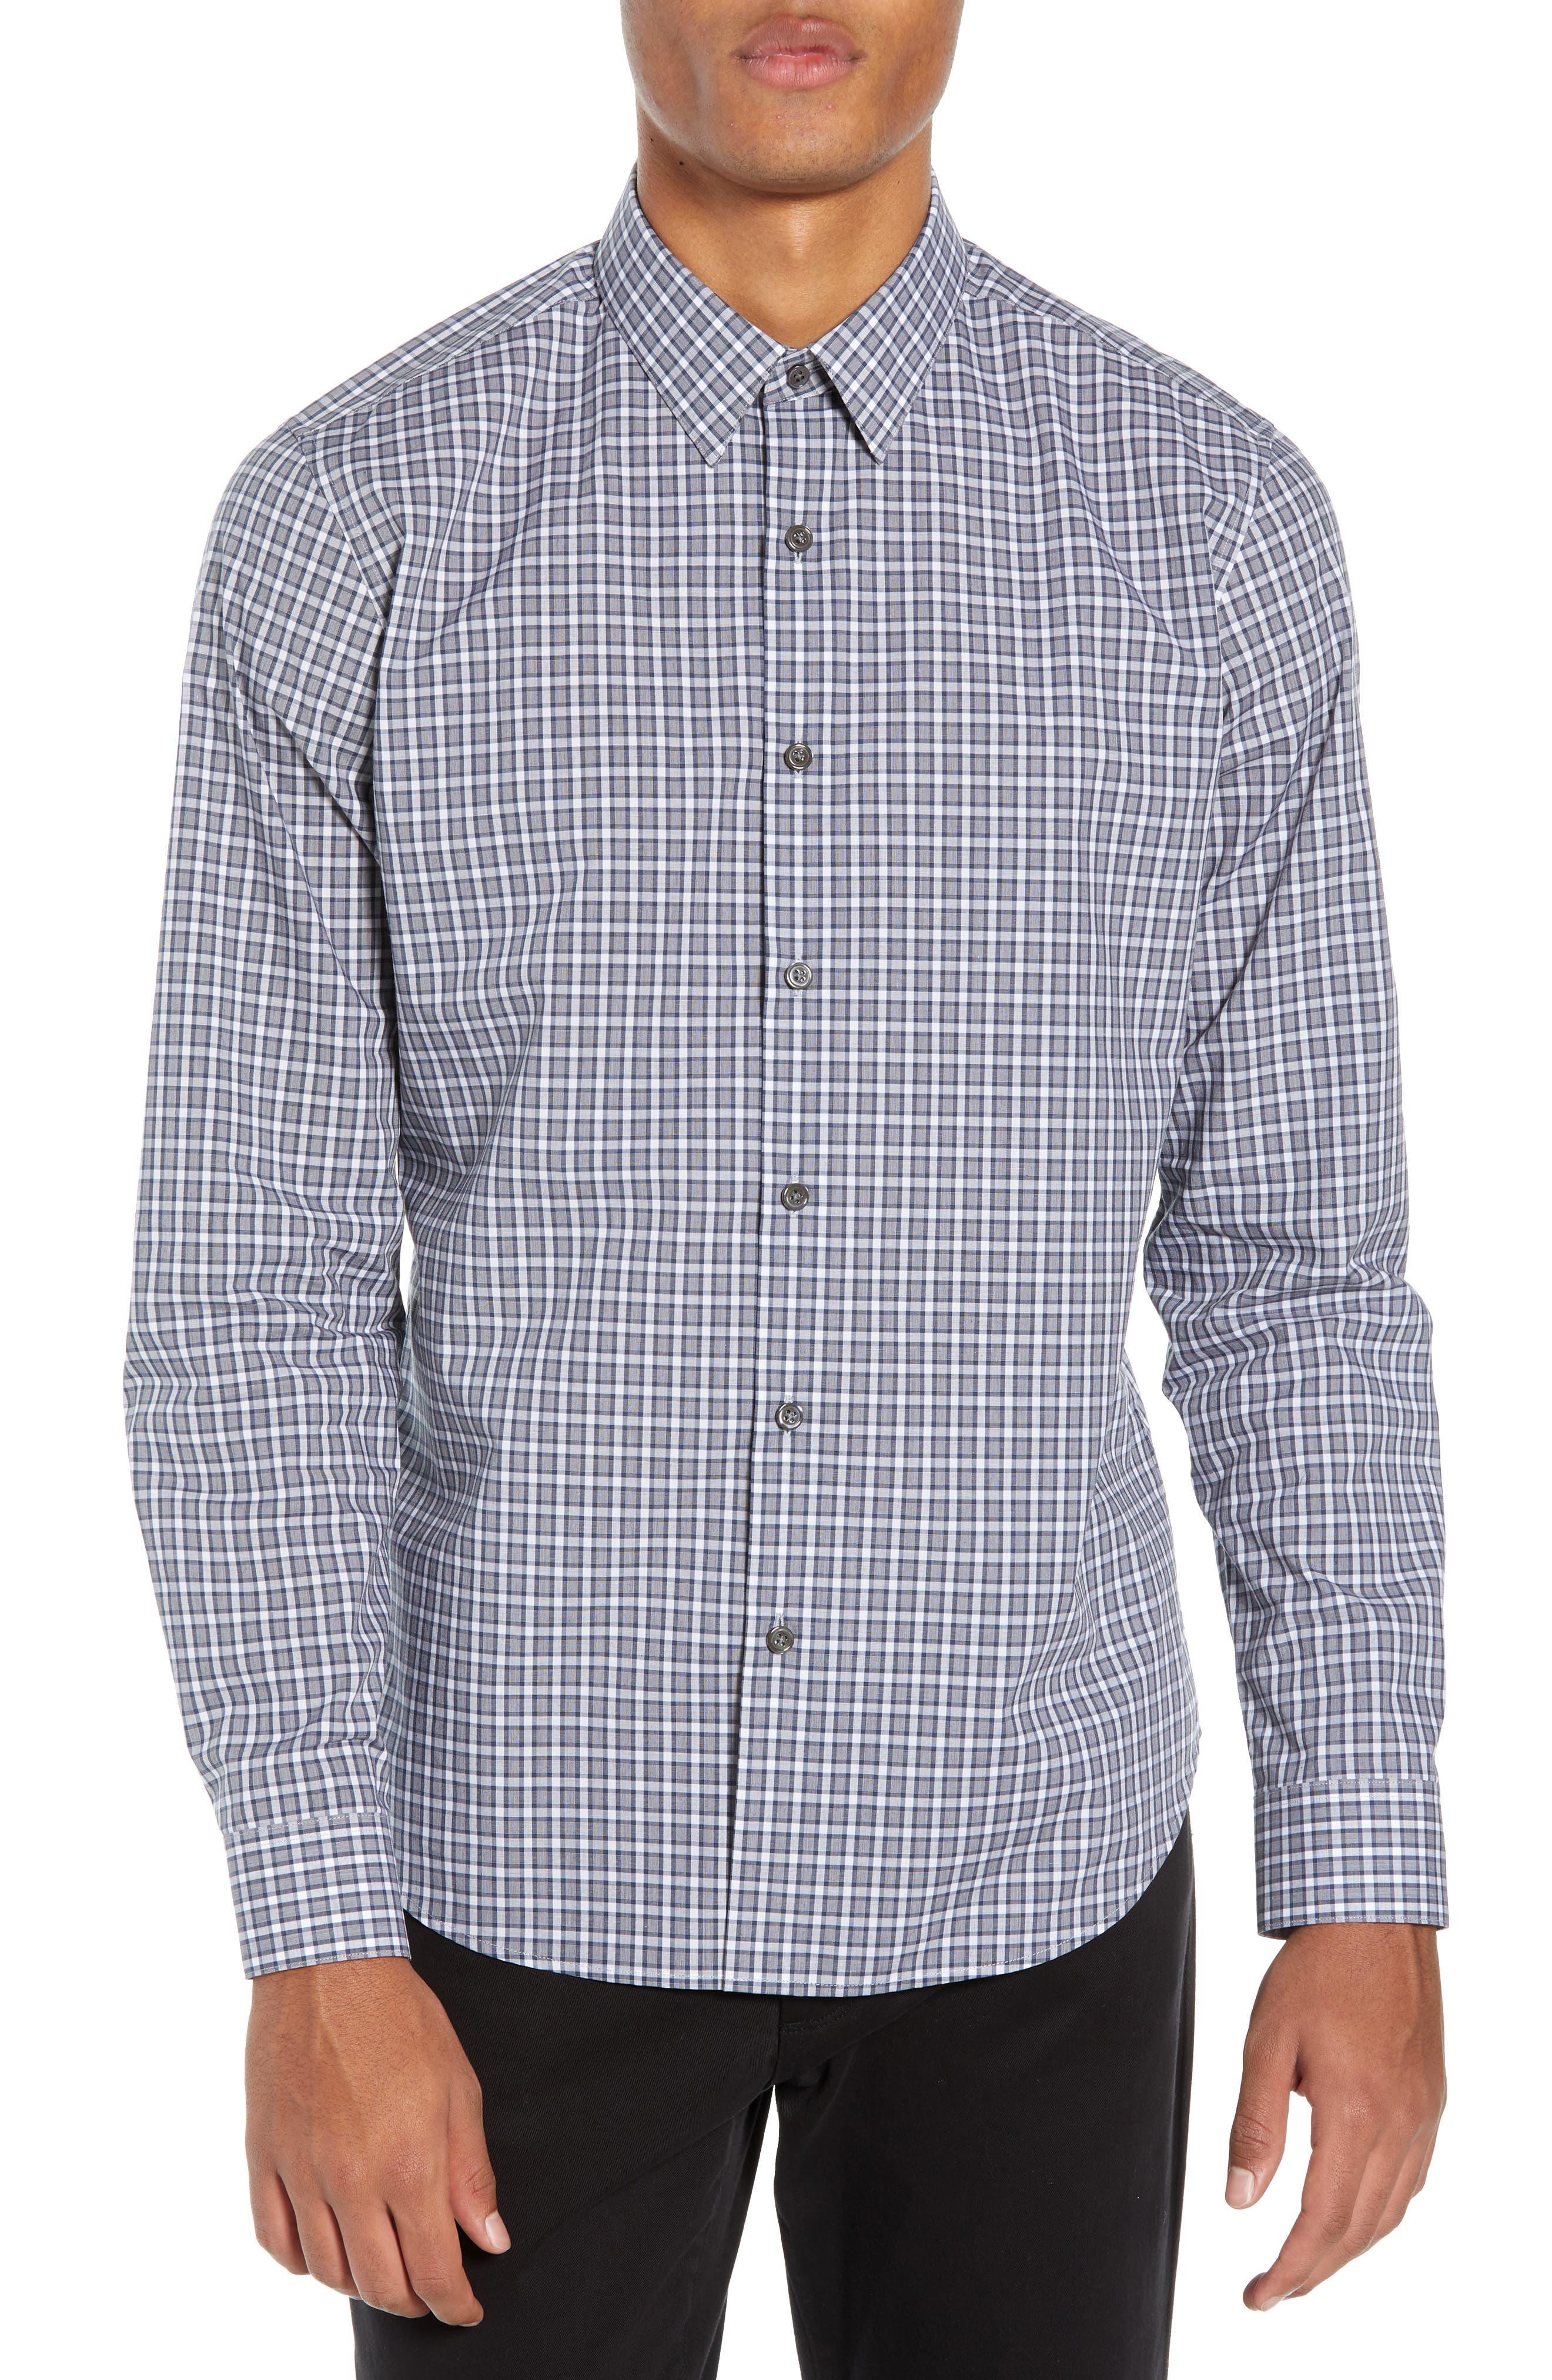 Sylvain Regular Fit Check Sport Shirt,                         Main,                         color, NAVY MULTI